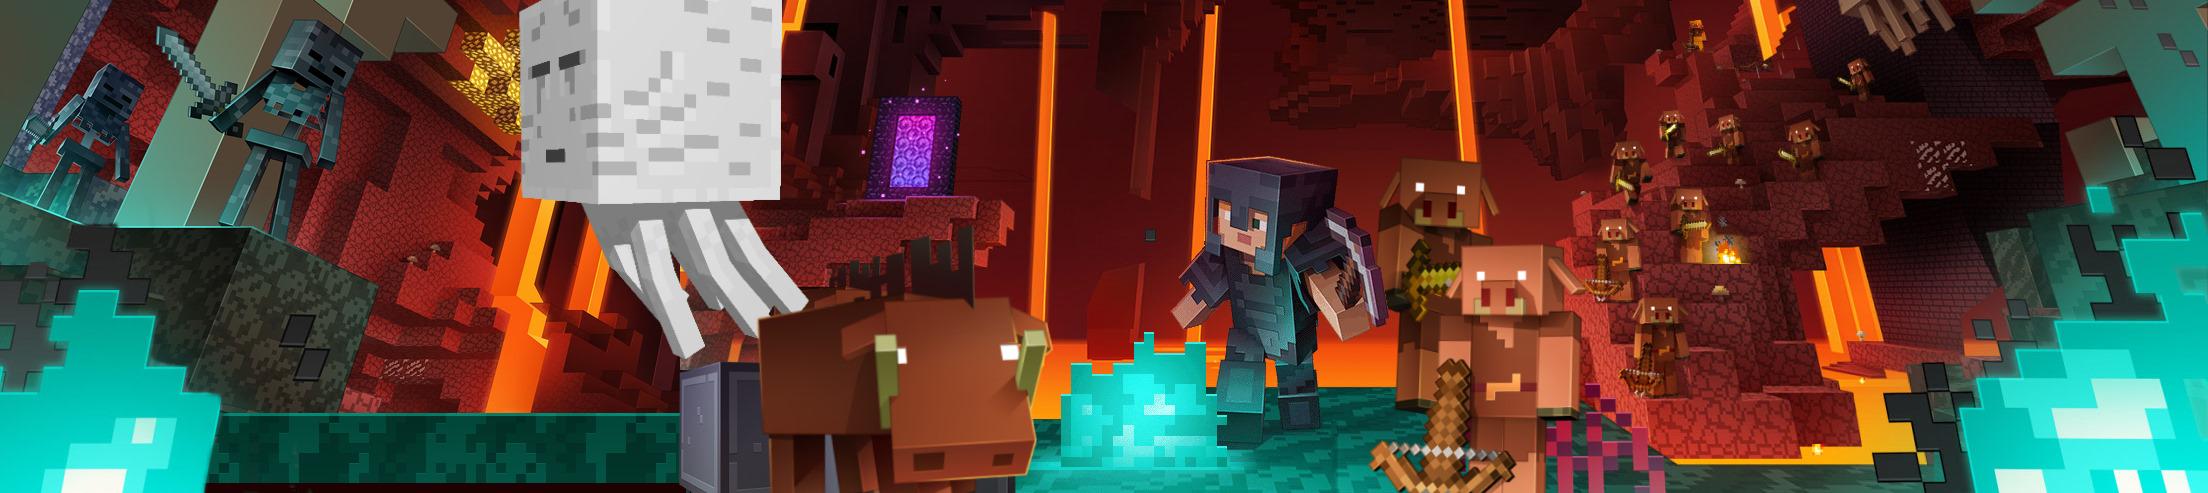 Guide Minecraft Header Image